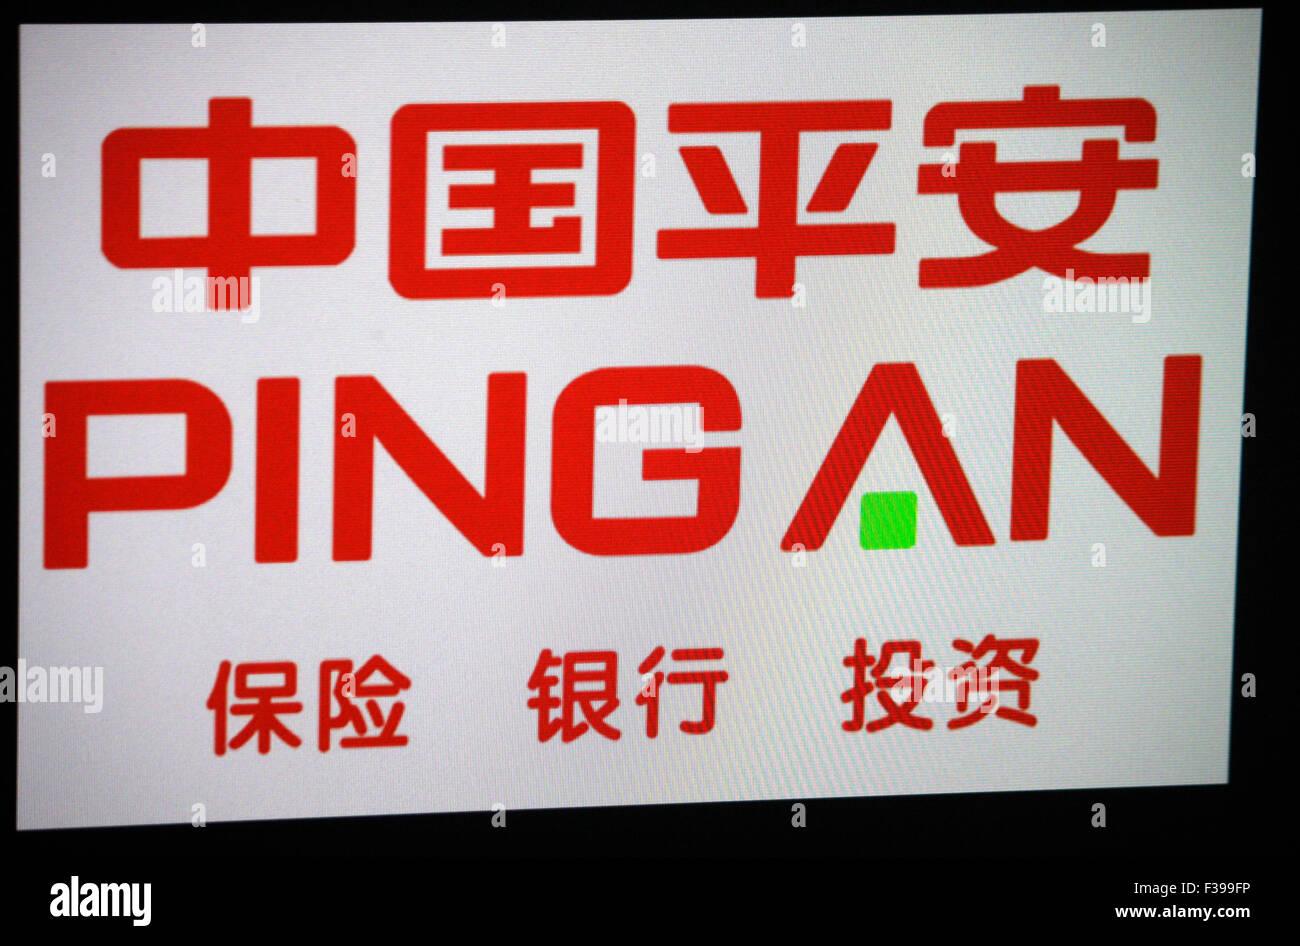 "Markenname: 'Pingan"", Berlin. Photo Stock"